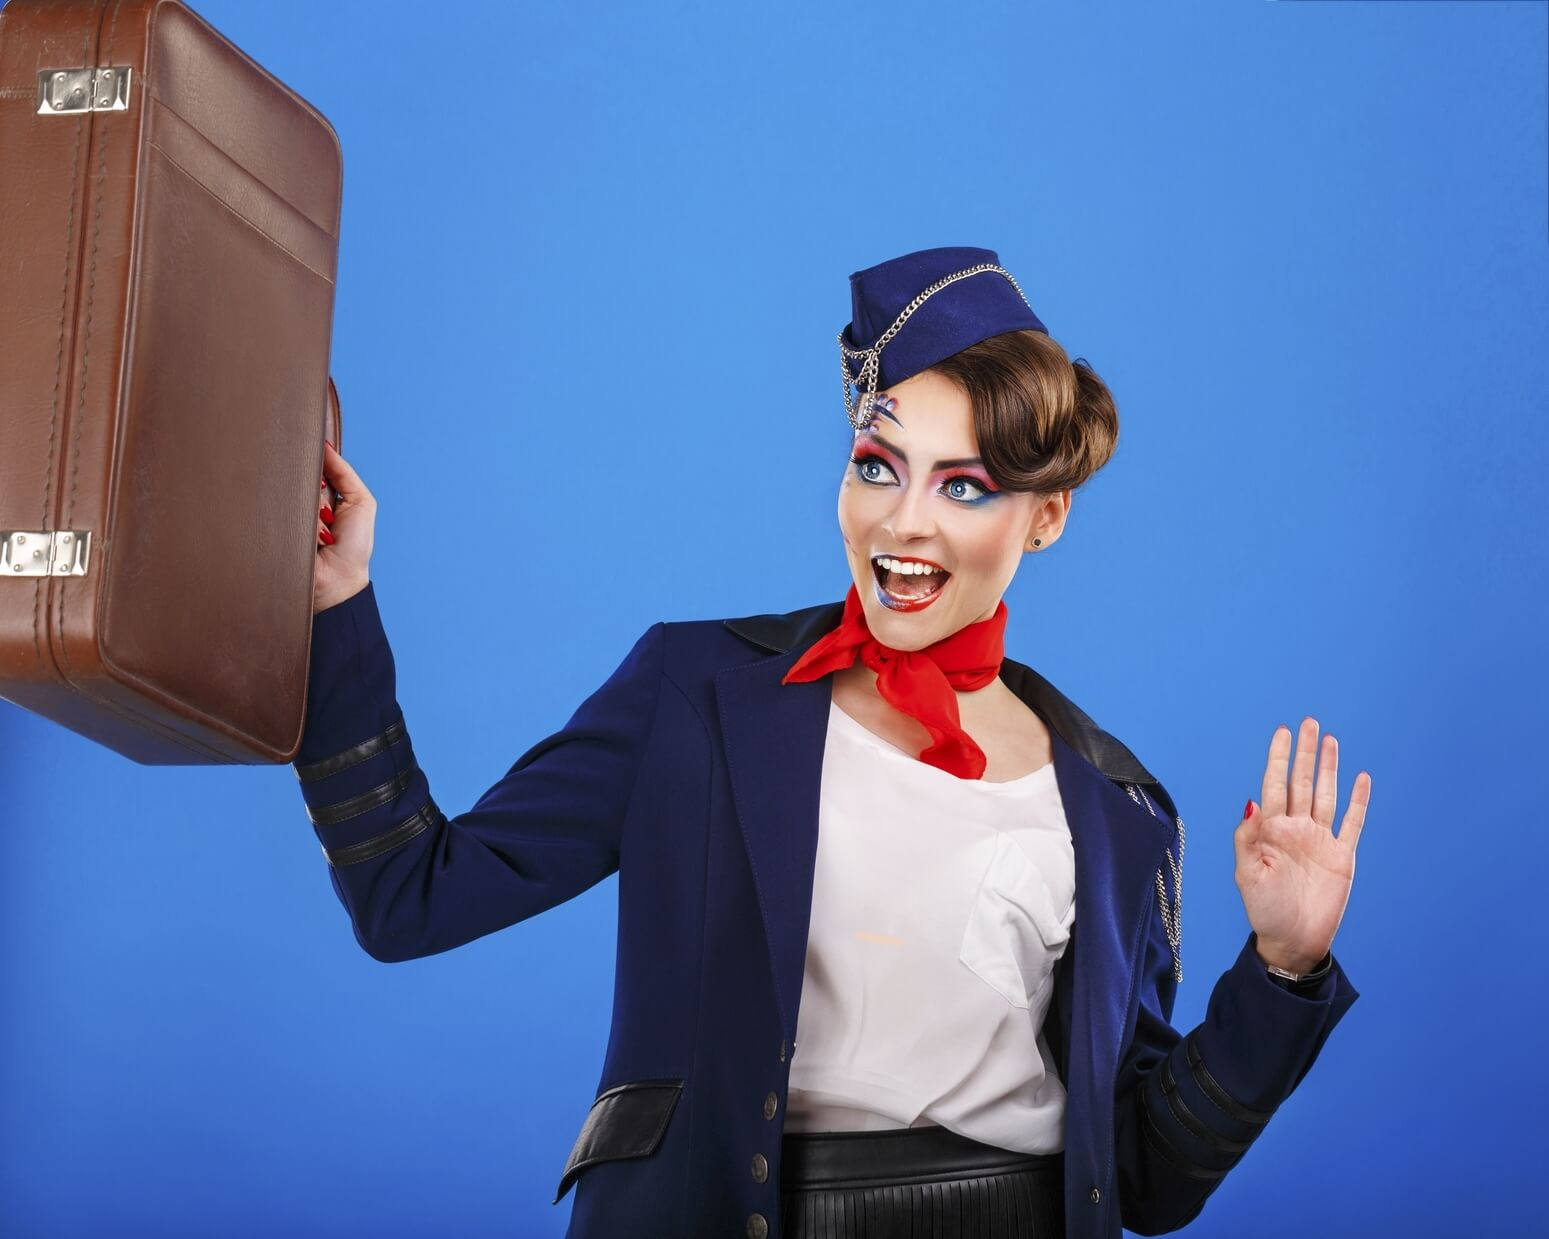 Air-Hostess.jpg.jpeg